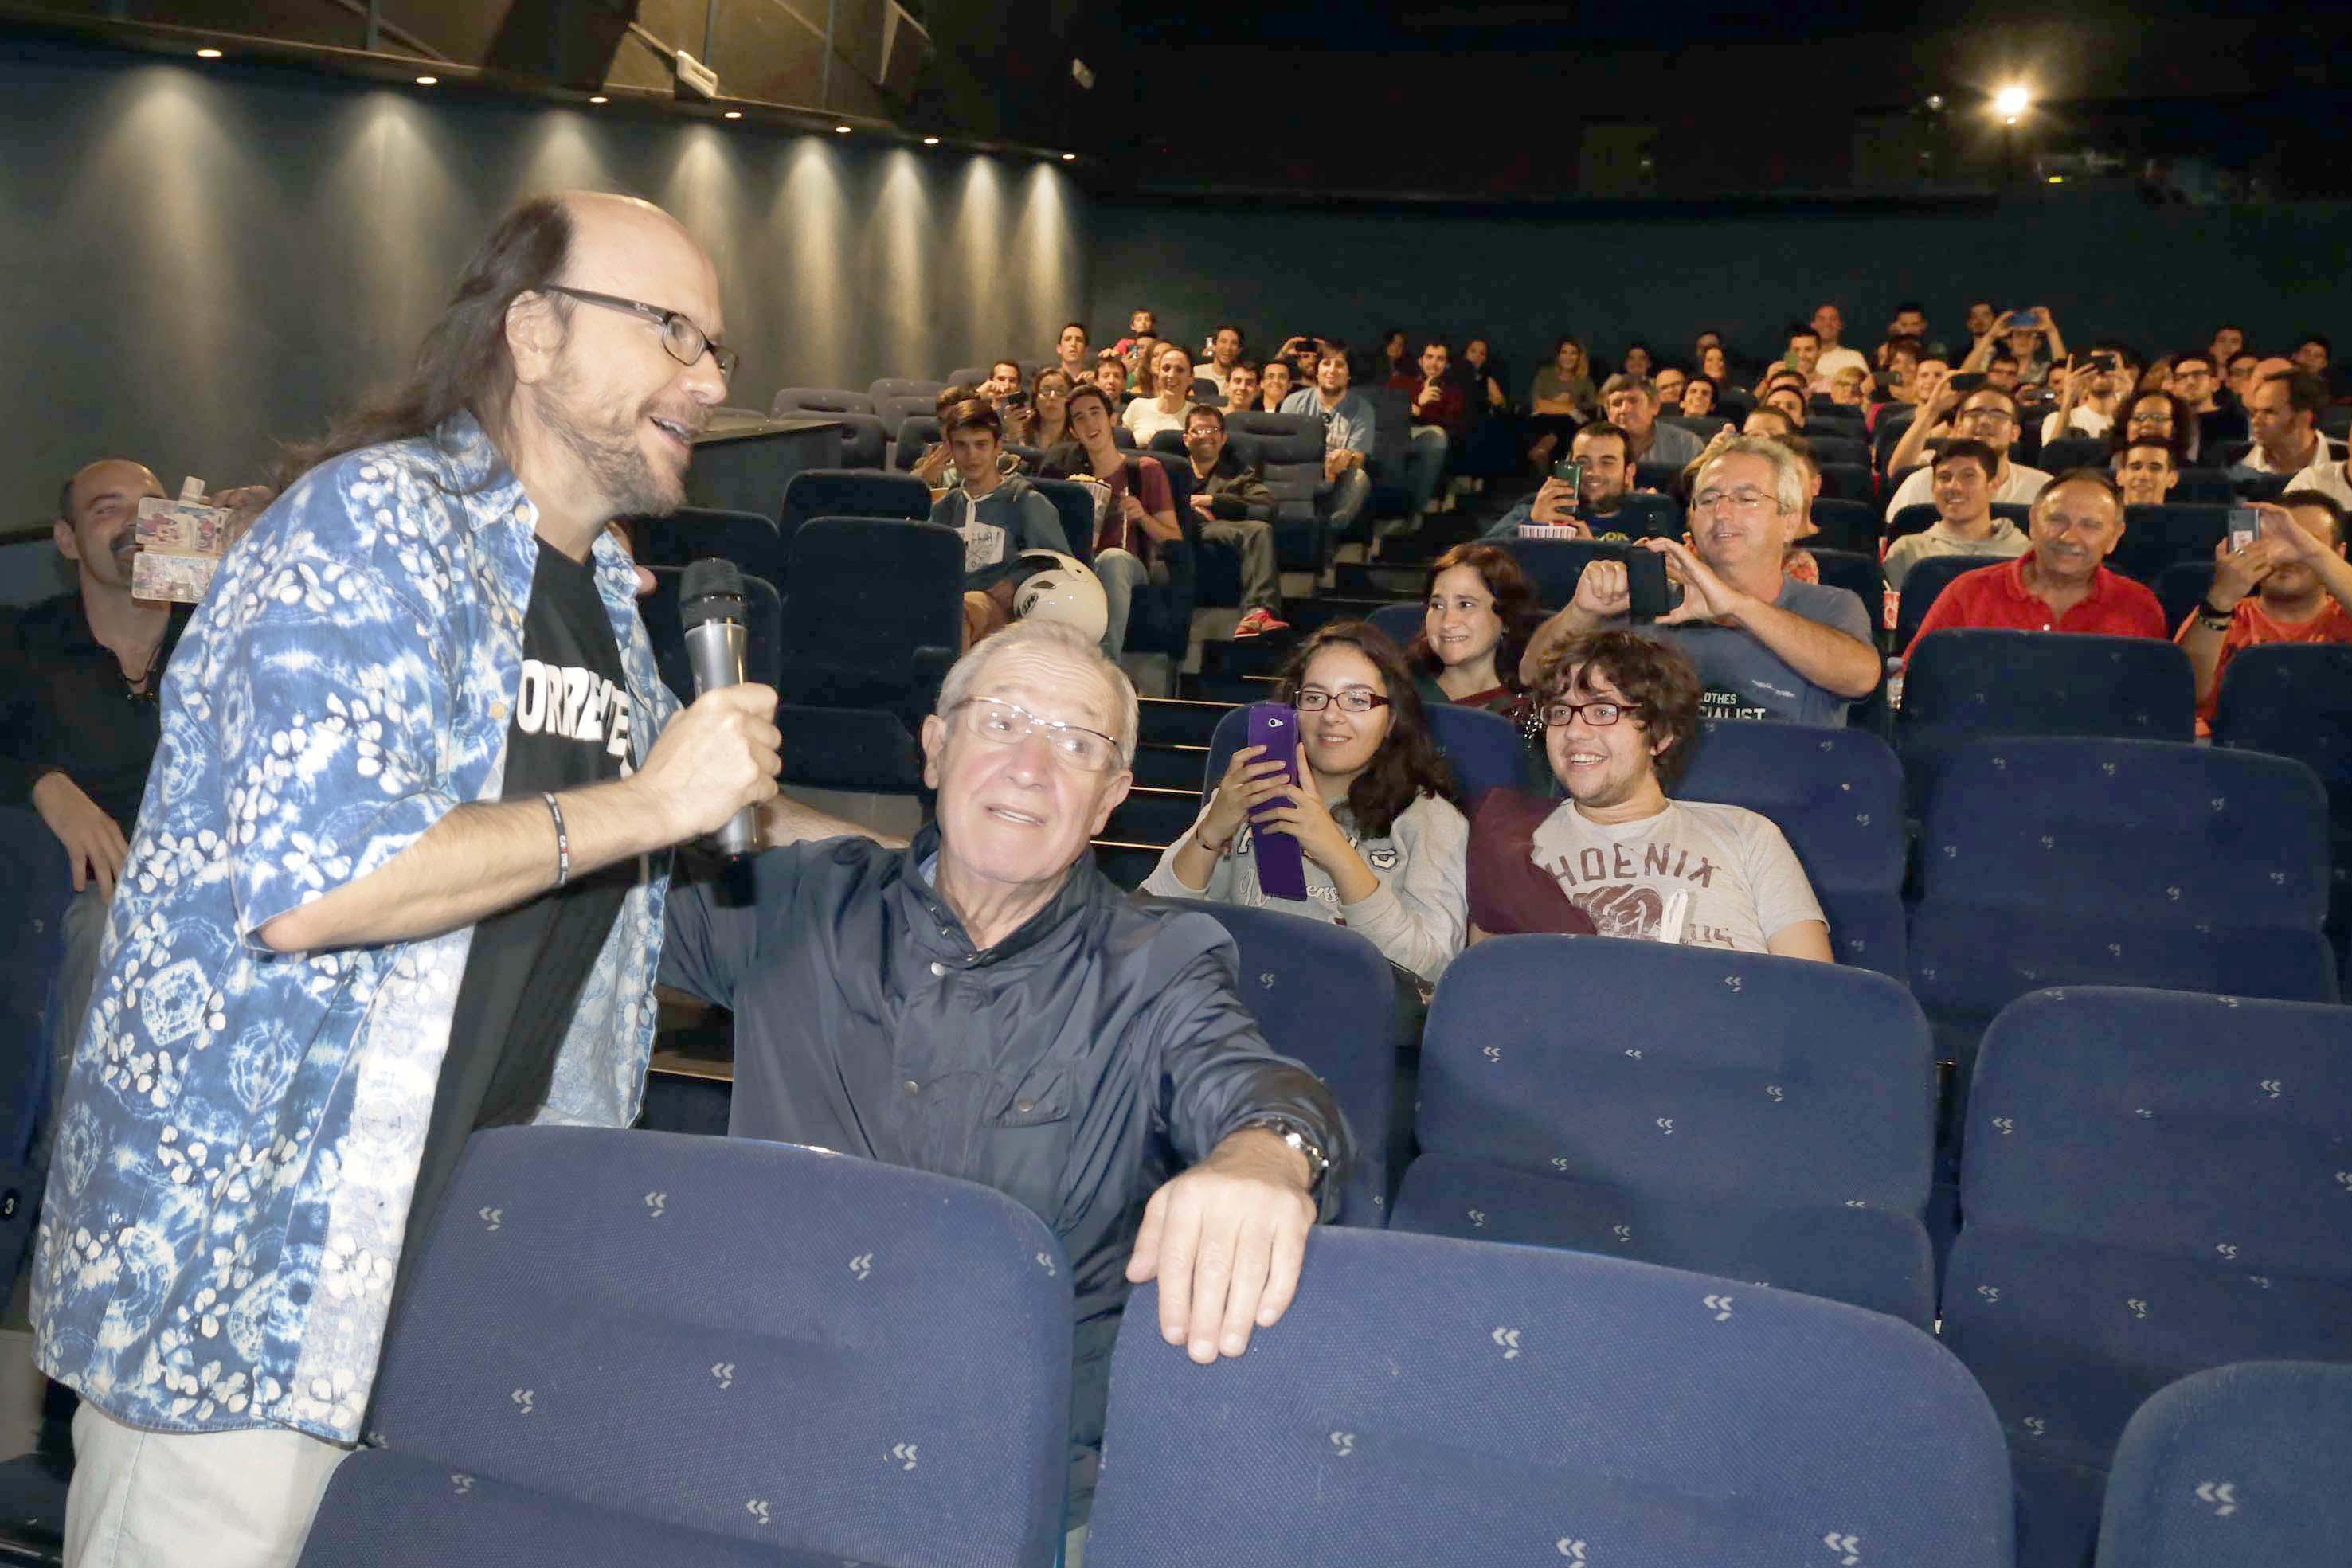 Espectadores en un cine sevillano con Santiago Segura. / José Luis Montero